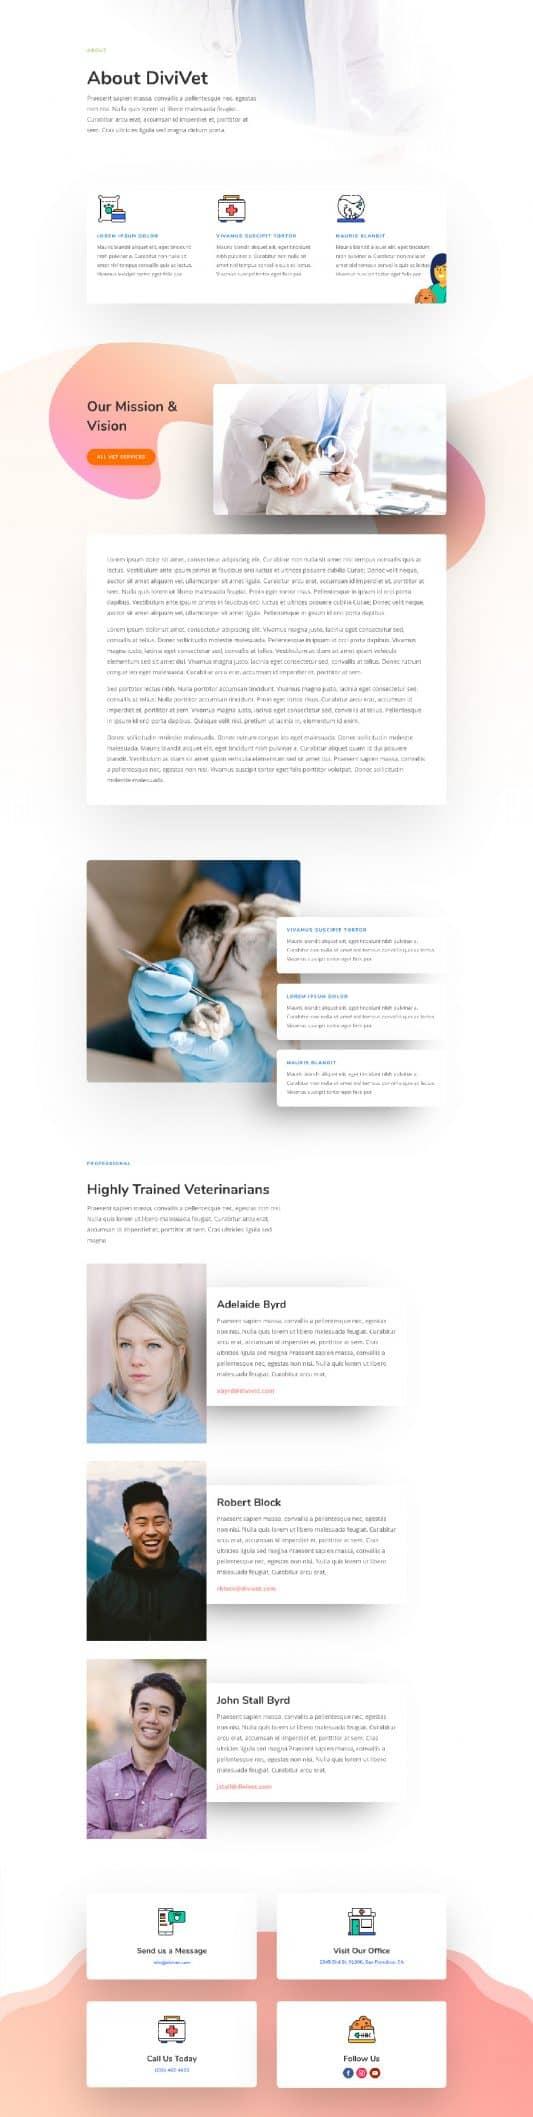 Veterinarian Web Design 1